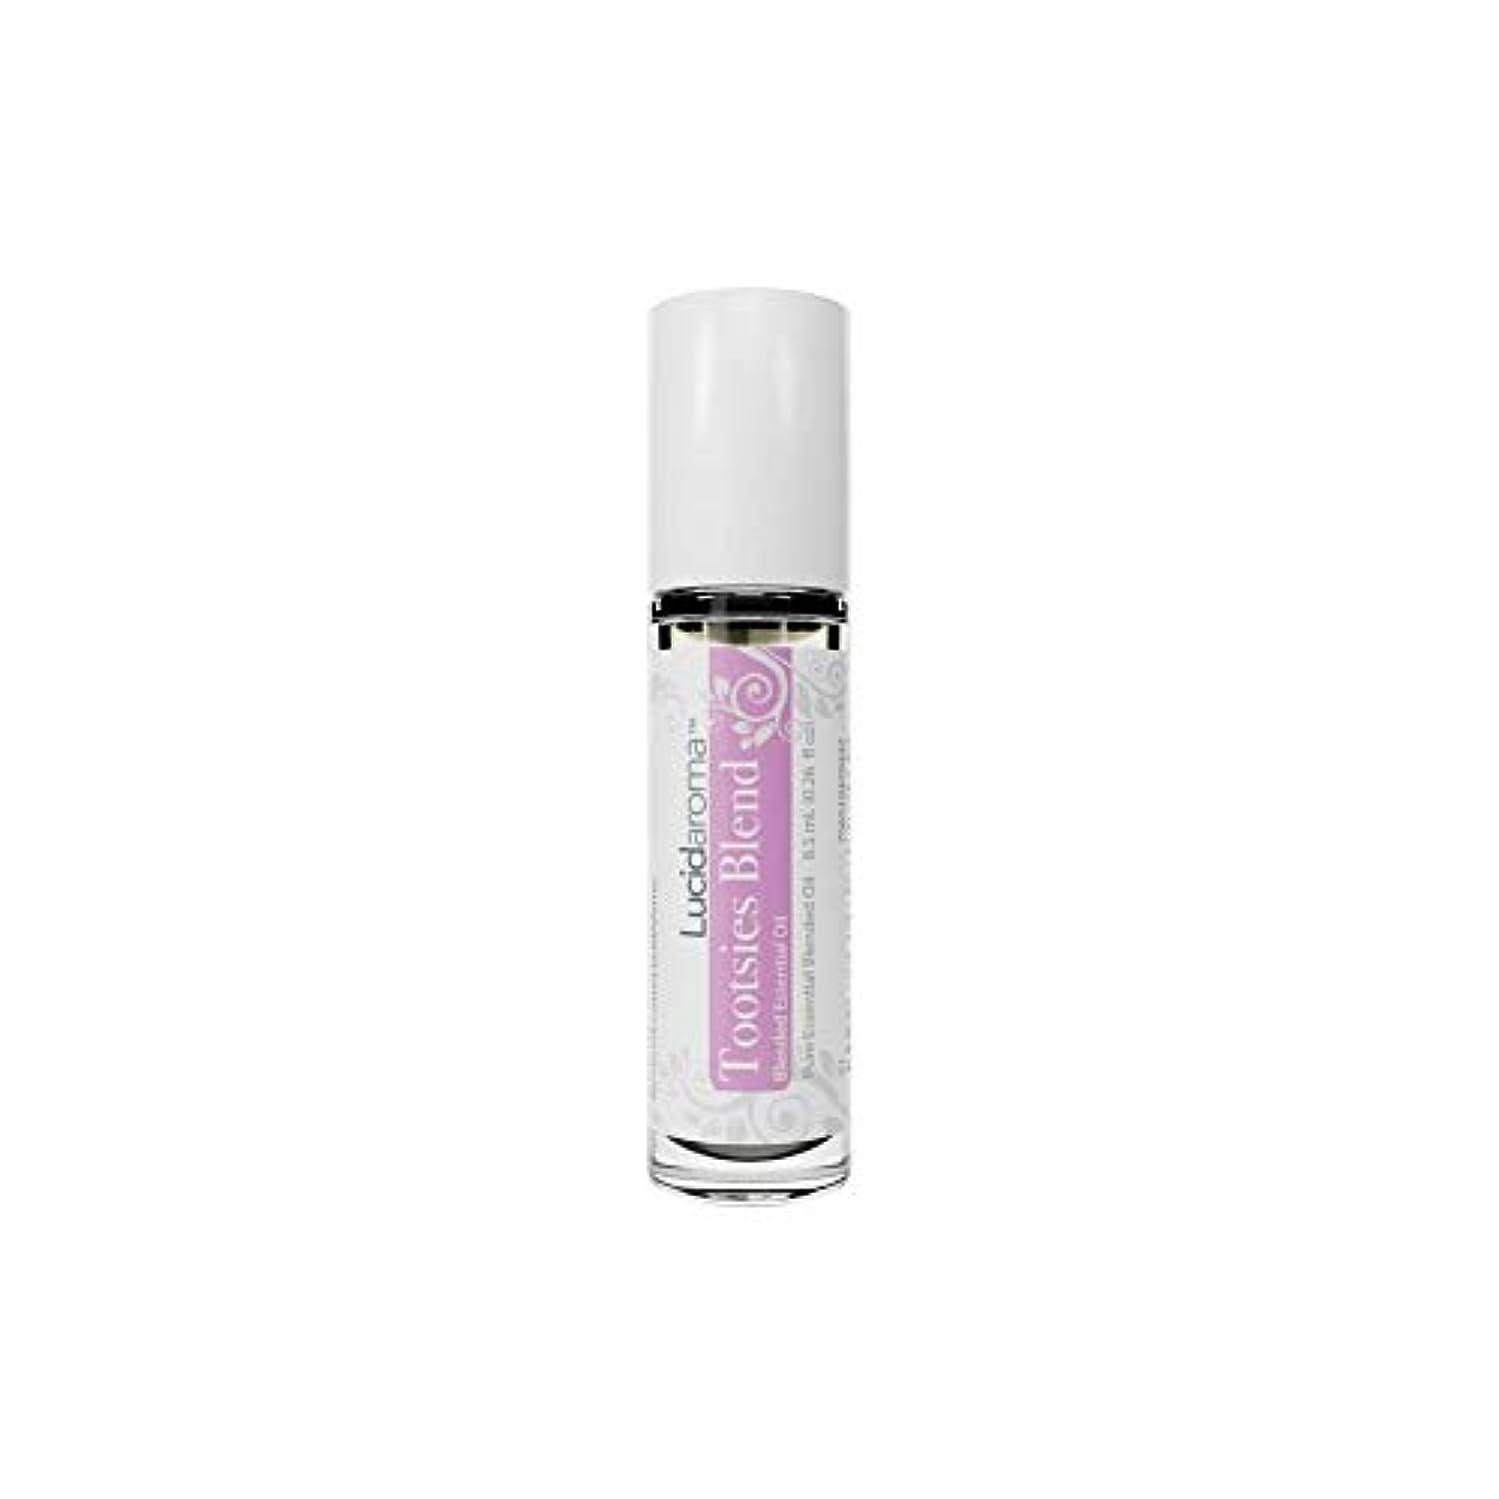 Lucid Aroma Tootsies Blend トッツィーブレンド ロールオン アロマオイル 8.5mL (塗るアロマ) 100%天然 携帯便利 ピュア エッセンシャル アメリカ製